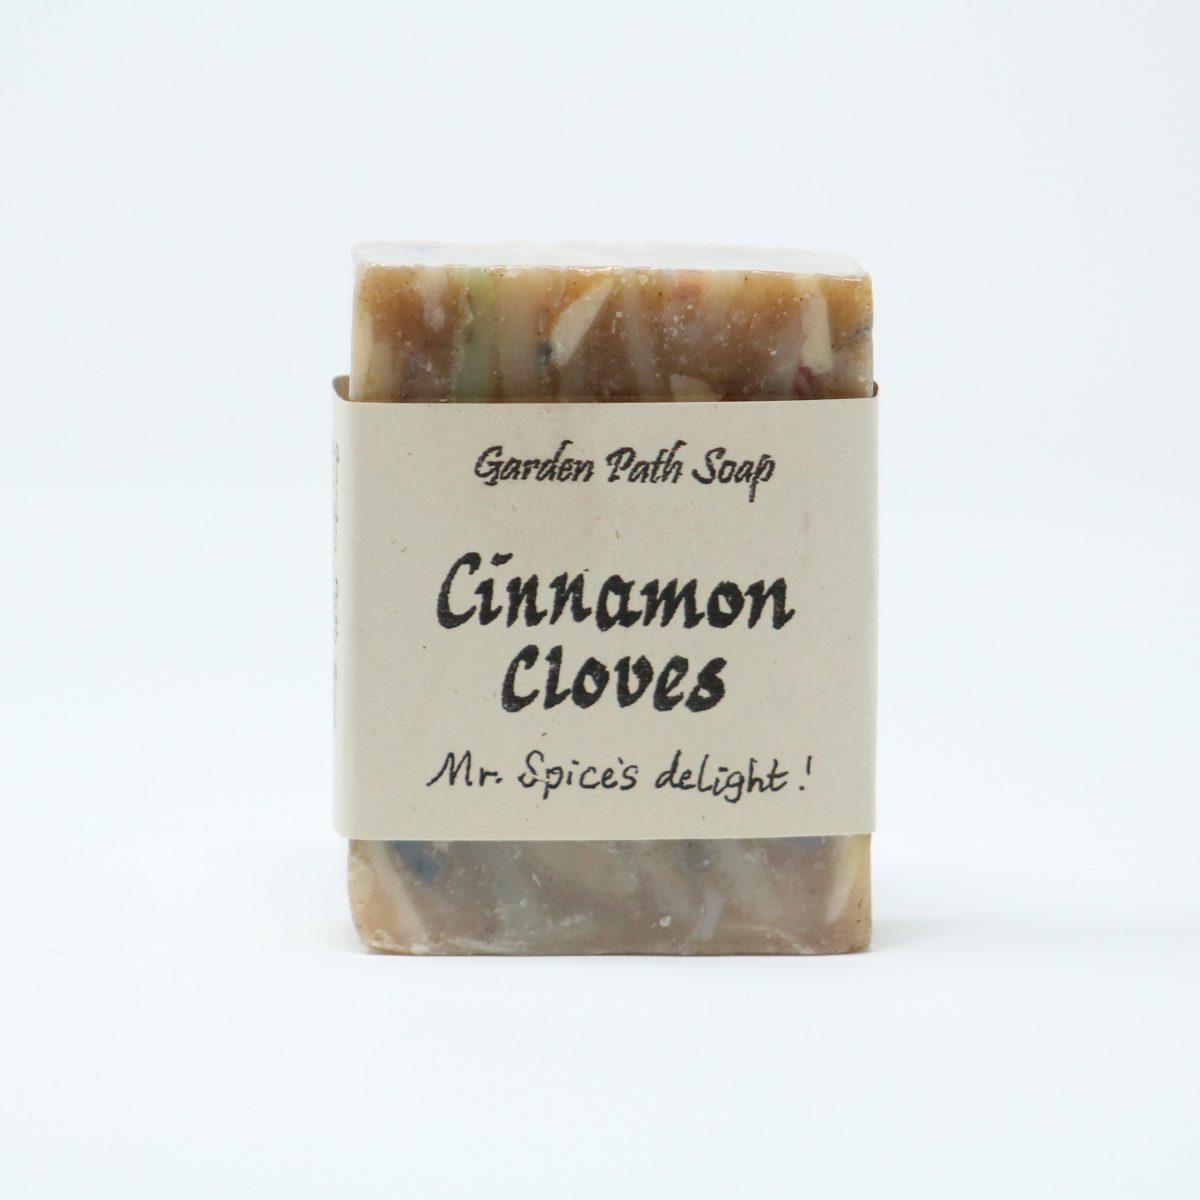 Cinnamon Cloves-Homemade Lye Soaps-Family Farm Handcrafts